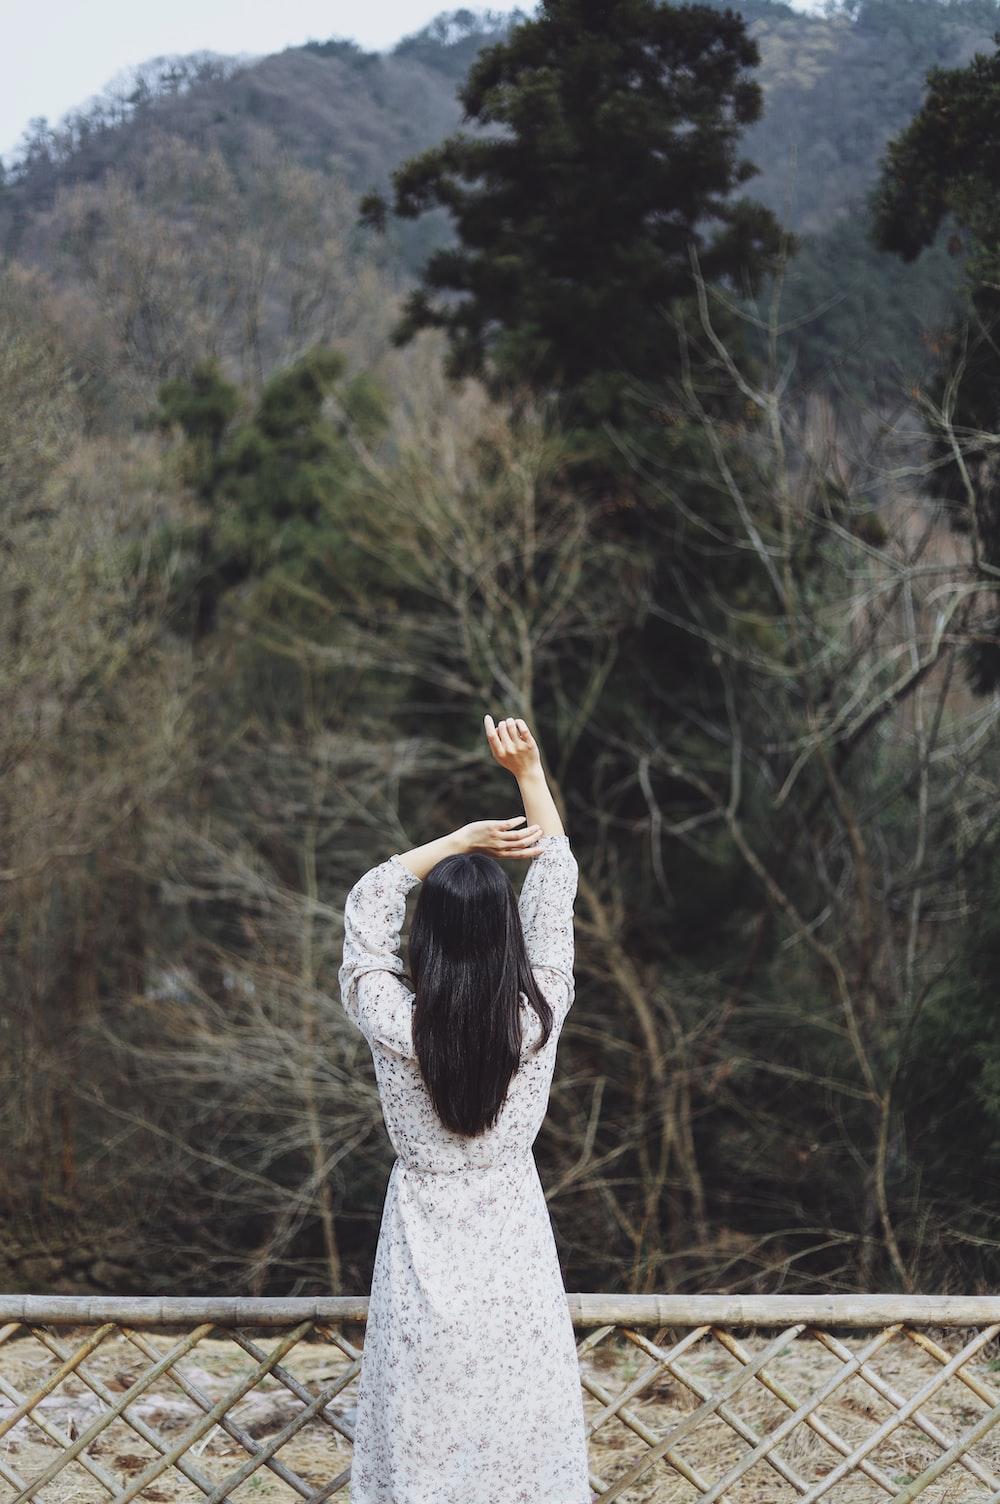 woman raised both hands near fence